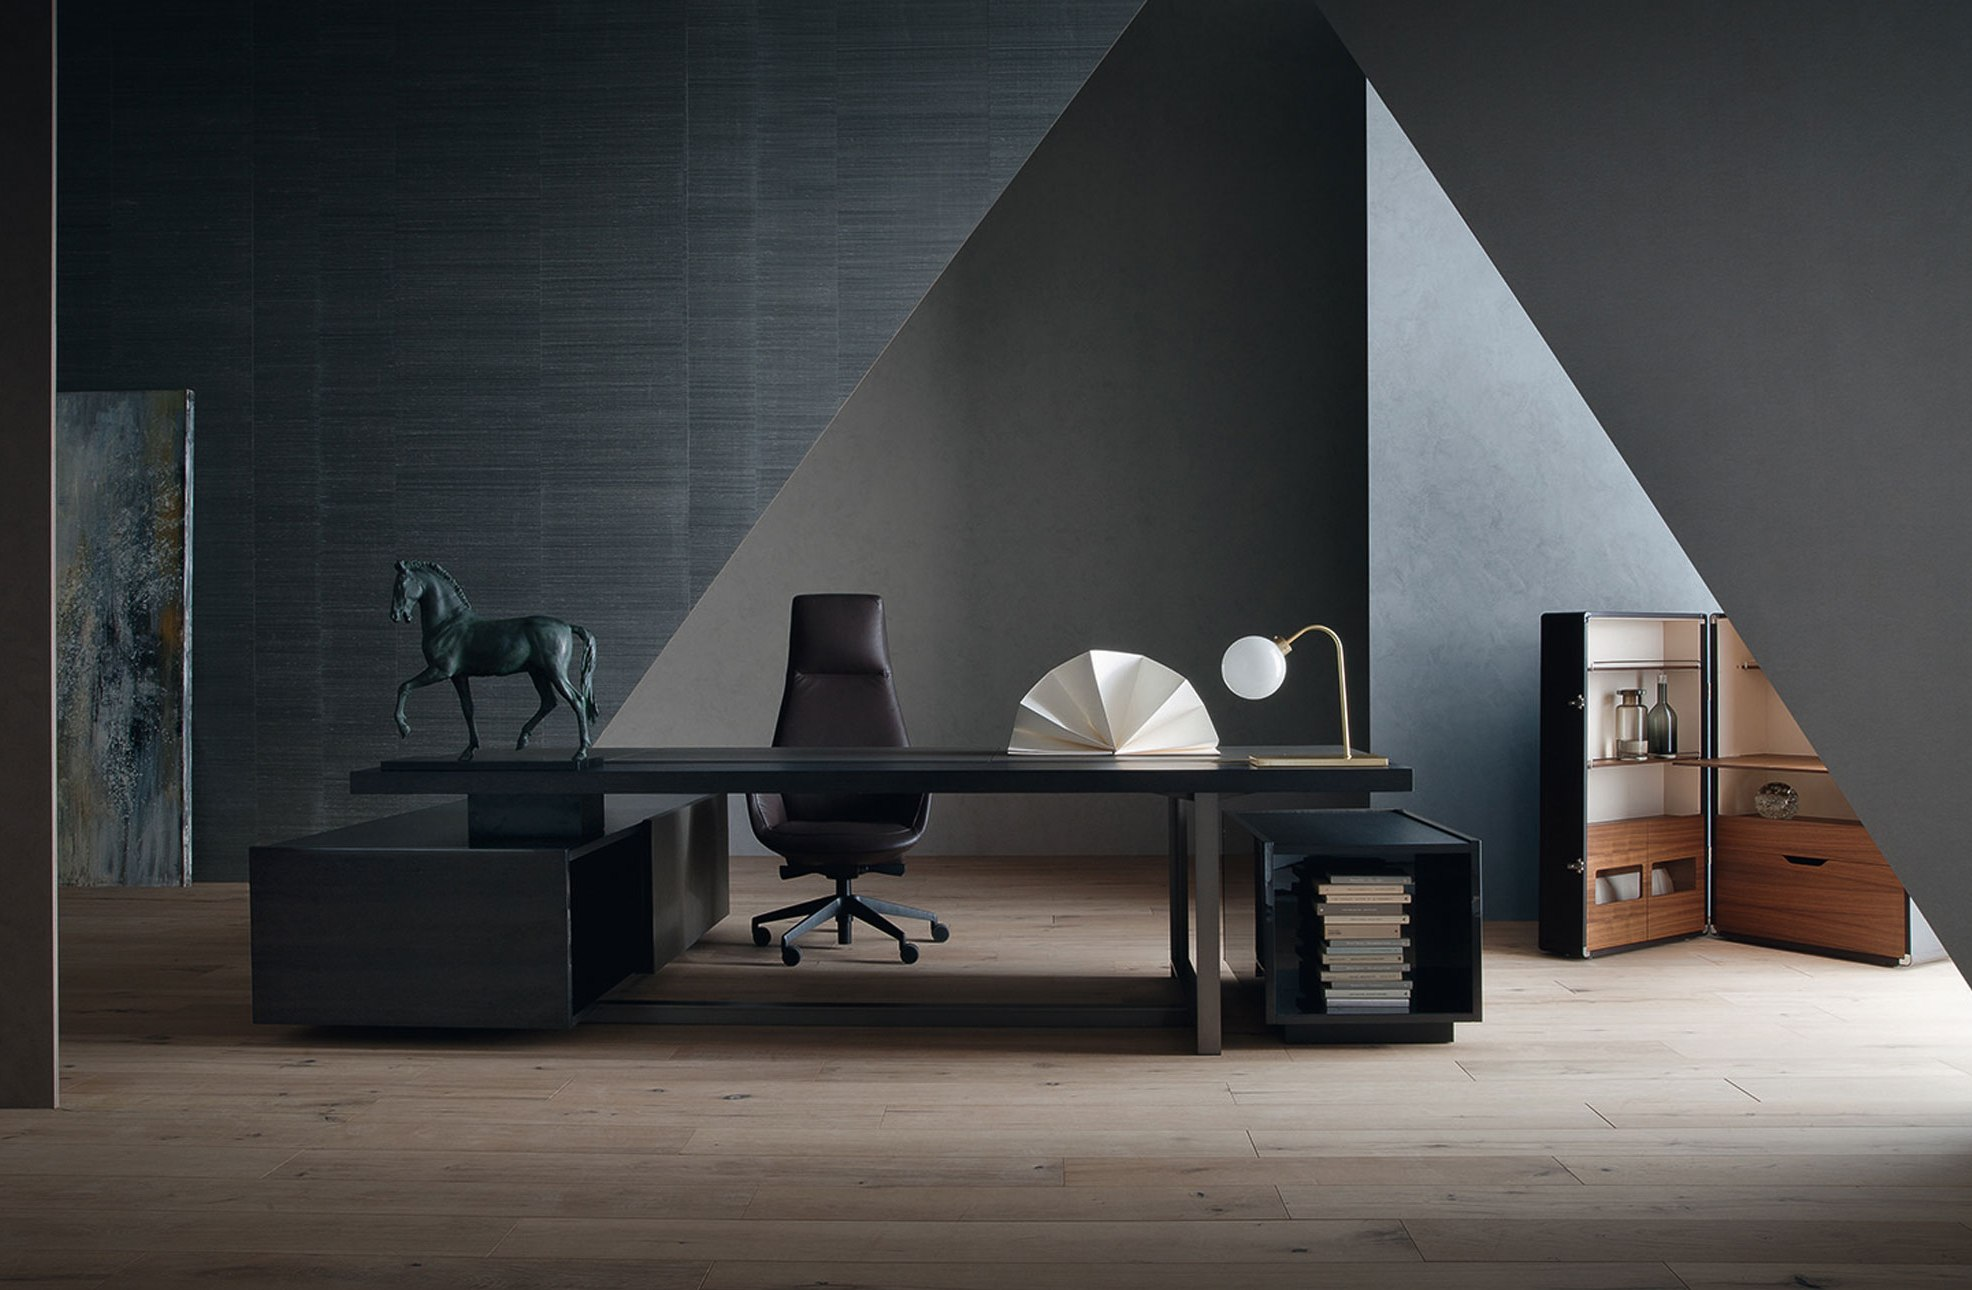 Muebles de dise o italiano para oficina poltrona frau - Muebles bano diseno italiano ...